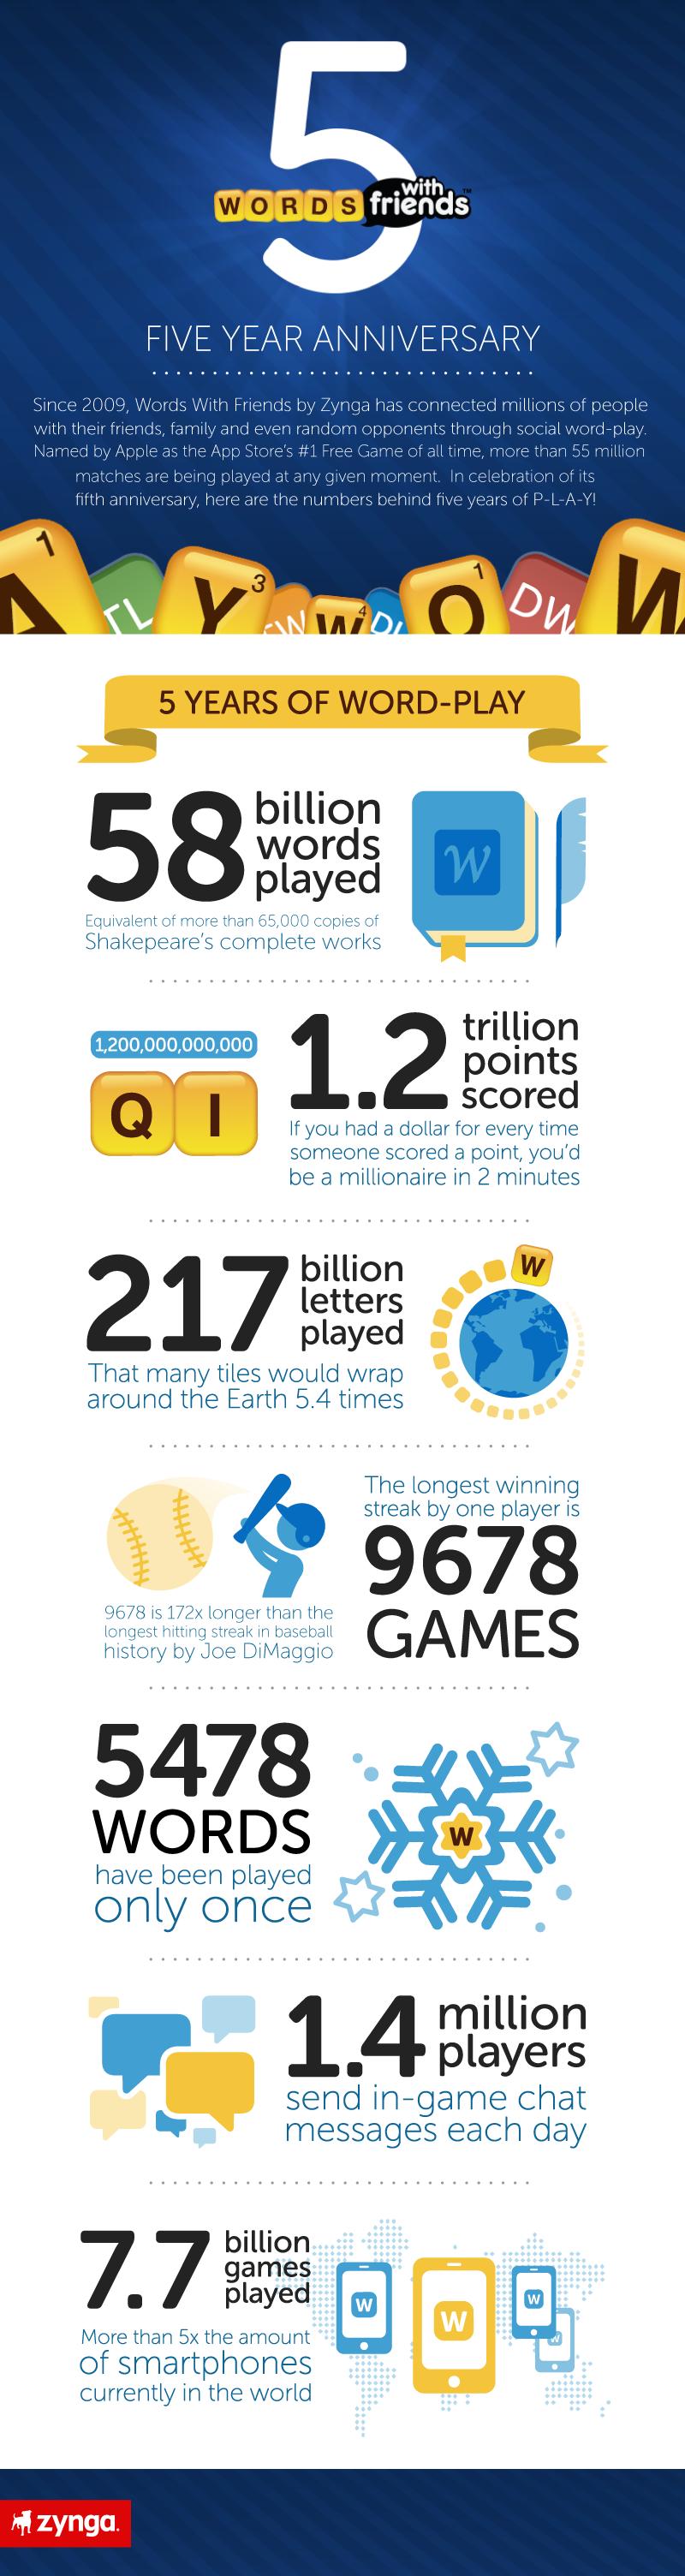 Wwf 5 year infographic 5 yr data